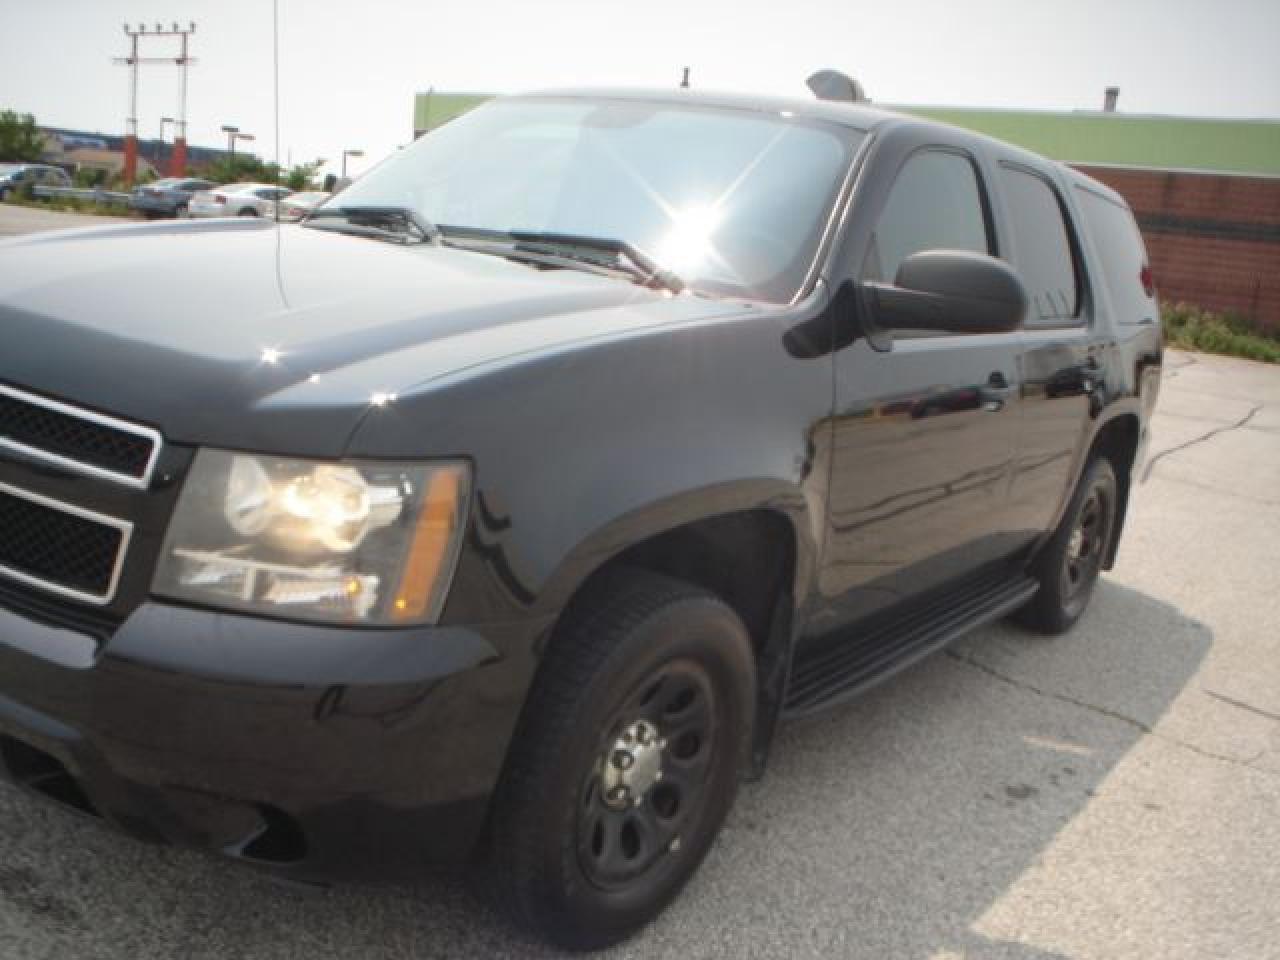 2009 Chevrolet Tahoe blk/blk ex police